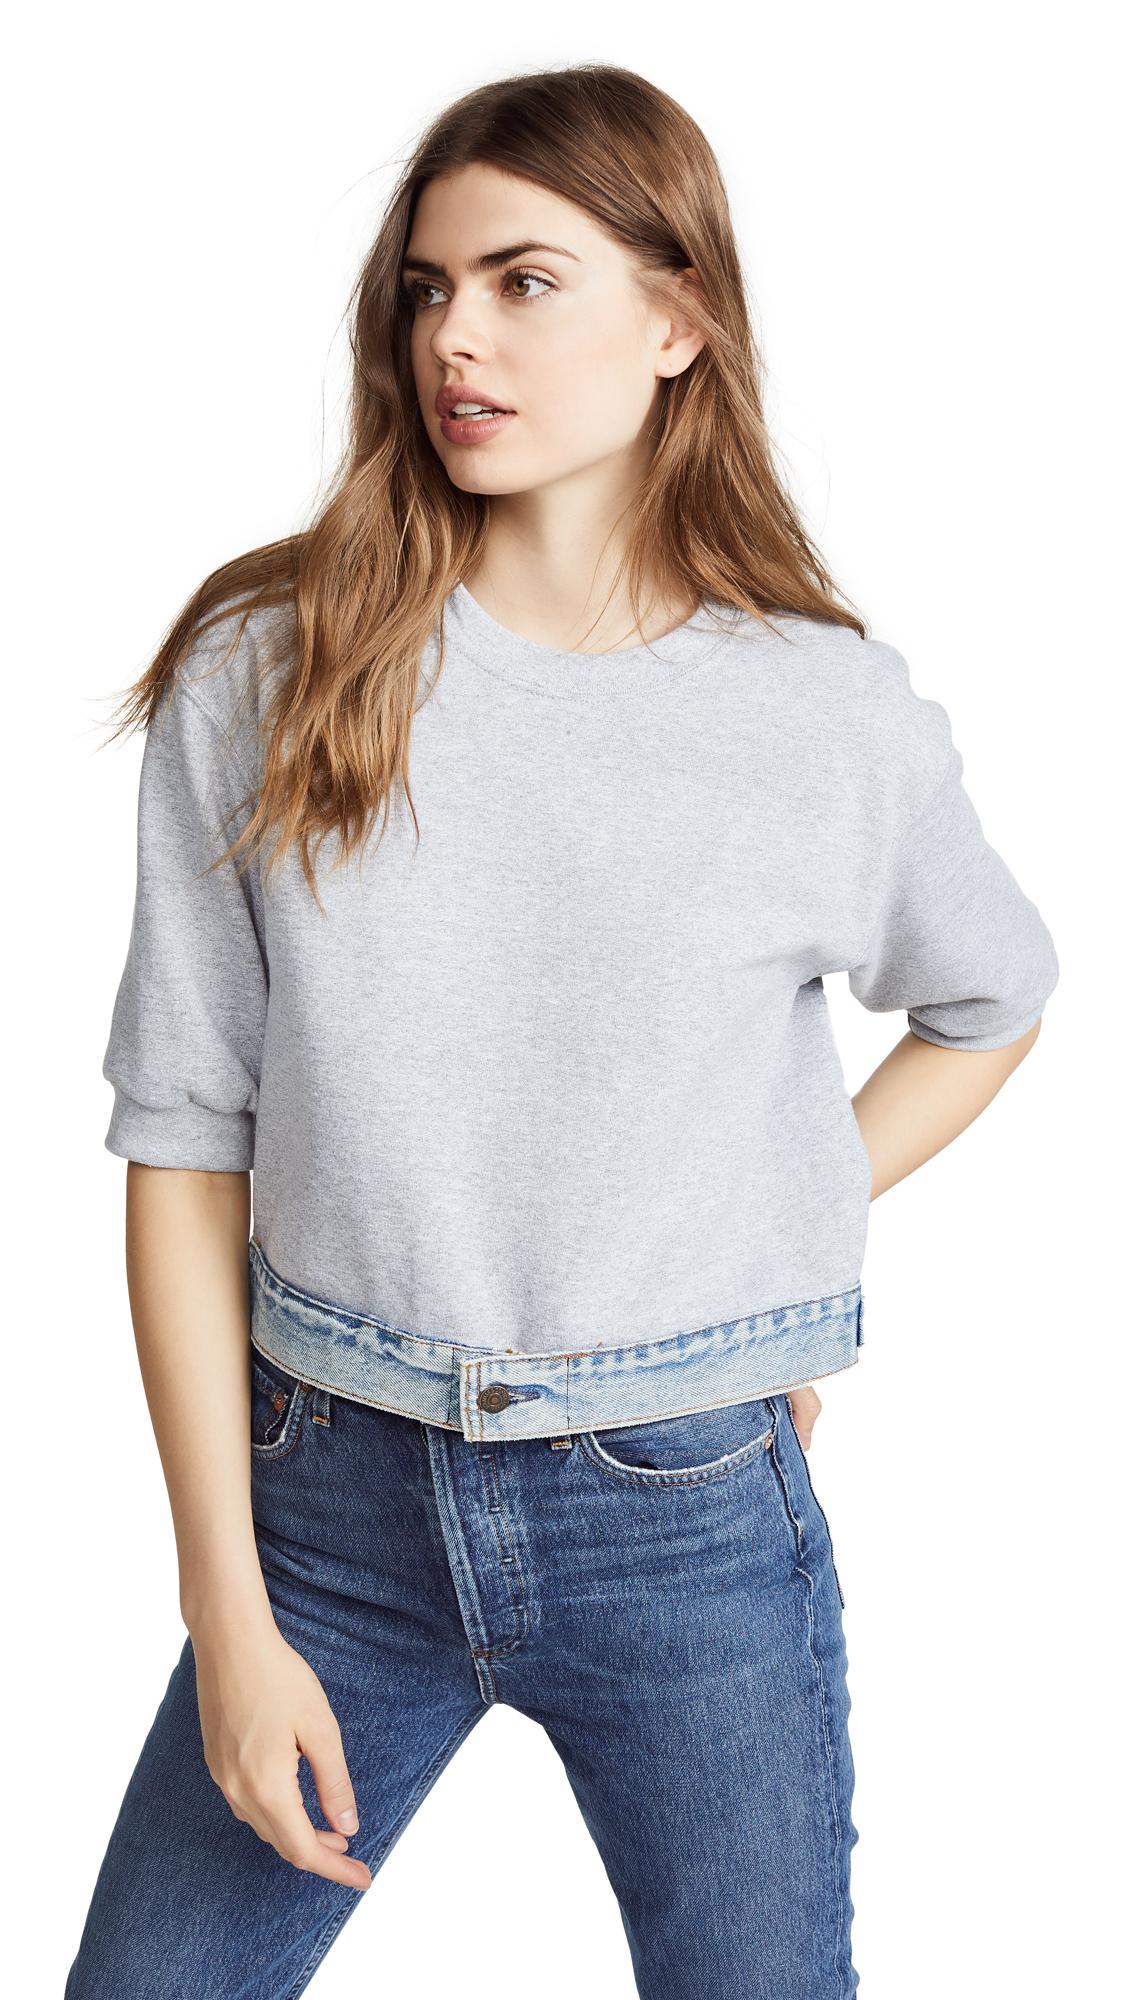 Harvey Faircloth Sweatshirt with Denim Waistband In Heather Grey